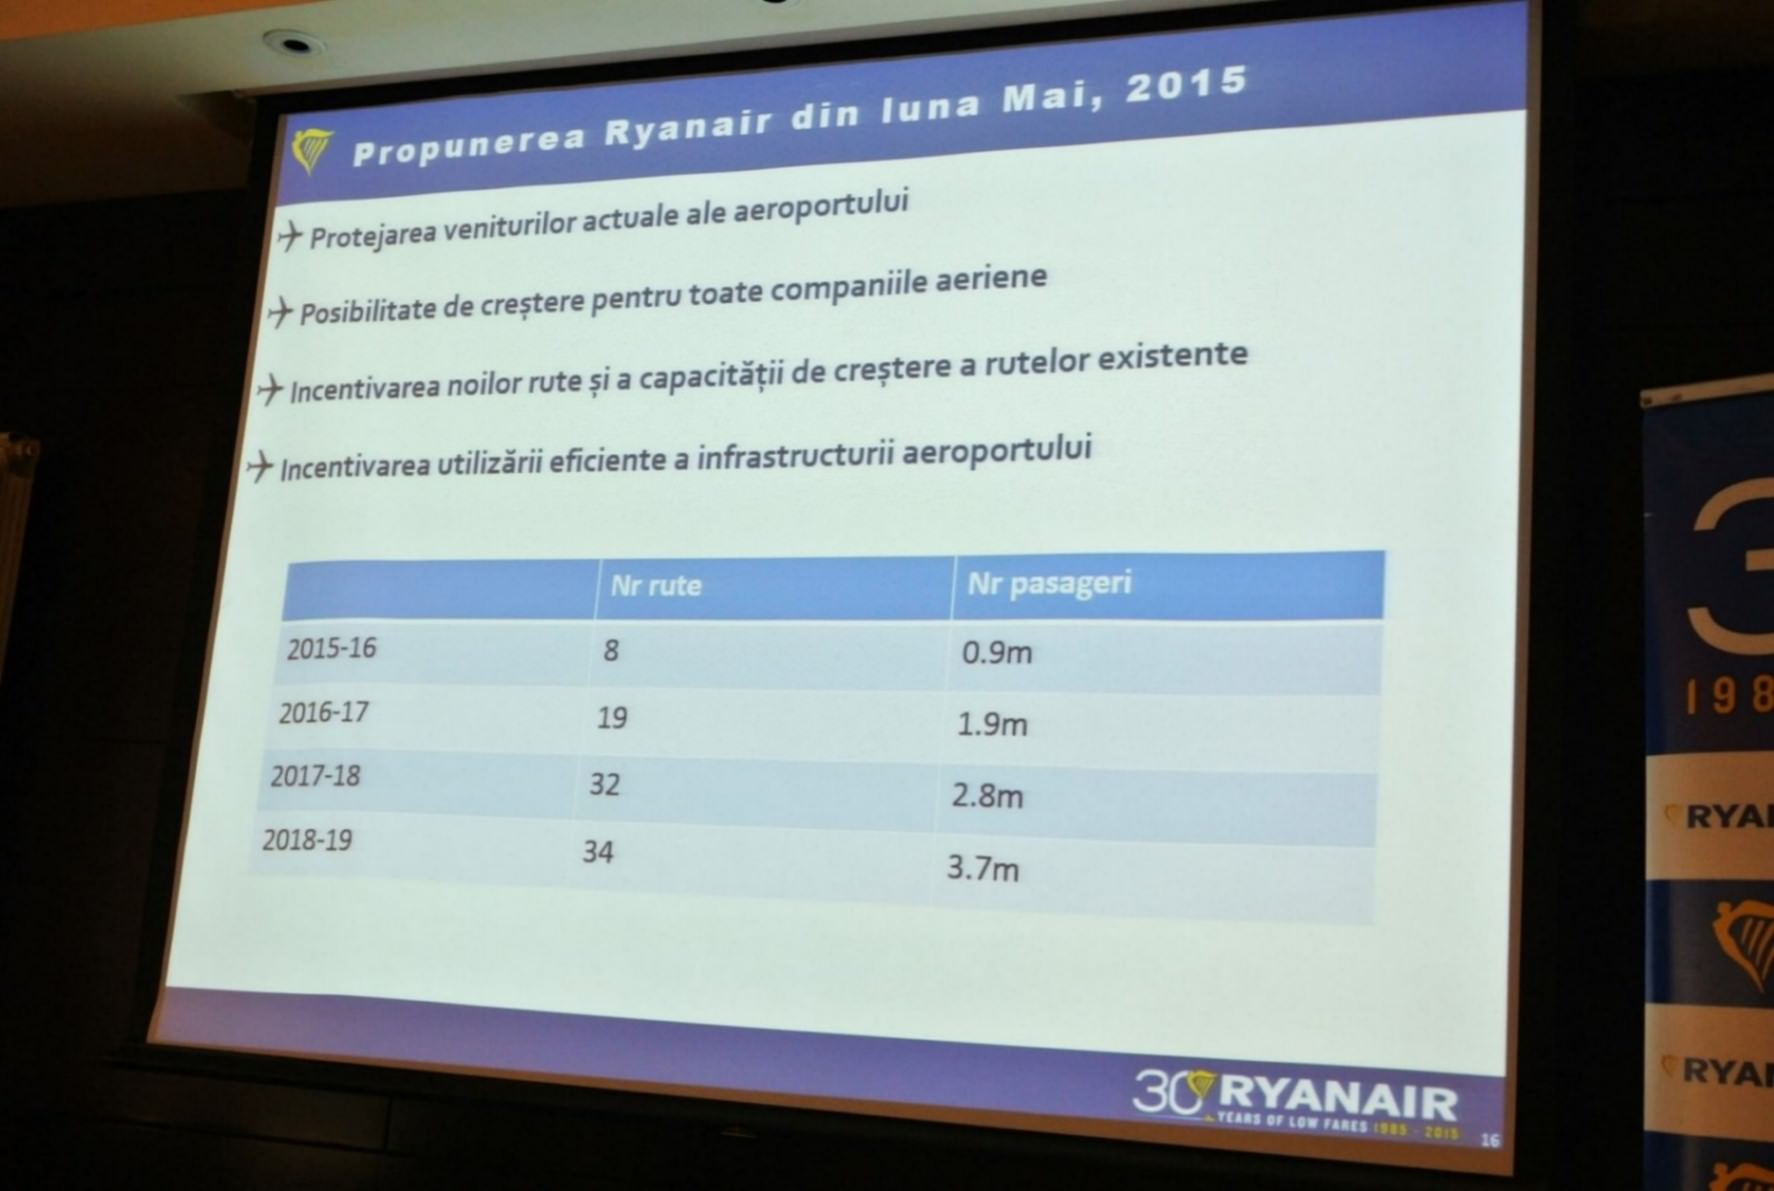 Propunere RyanAir Aeroport Otopeni